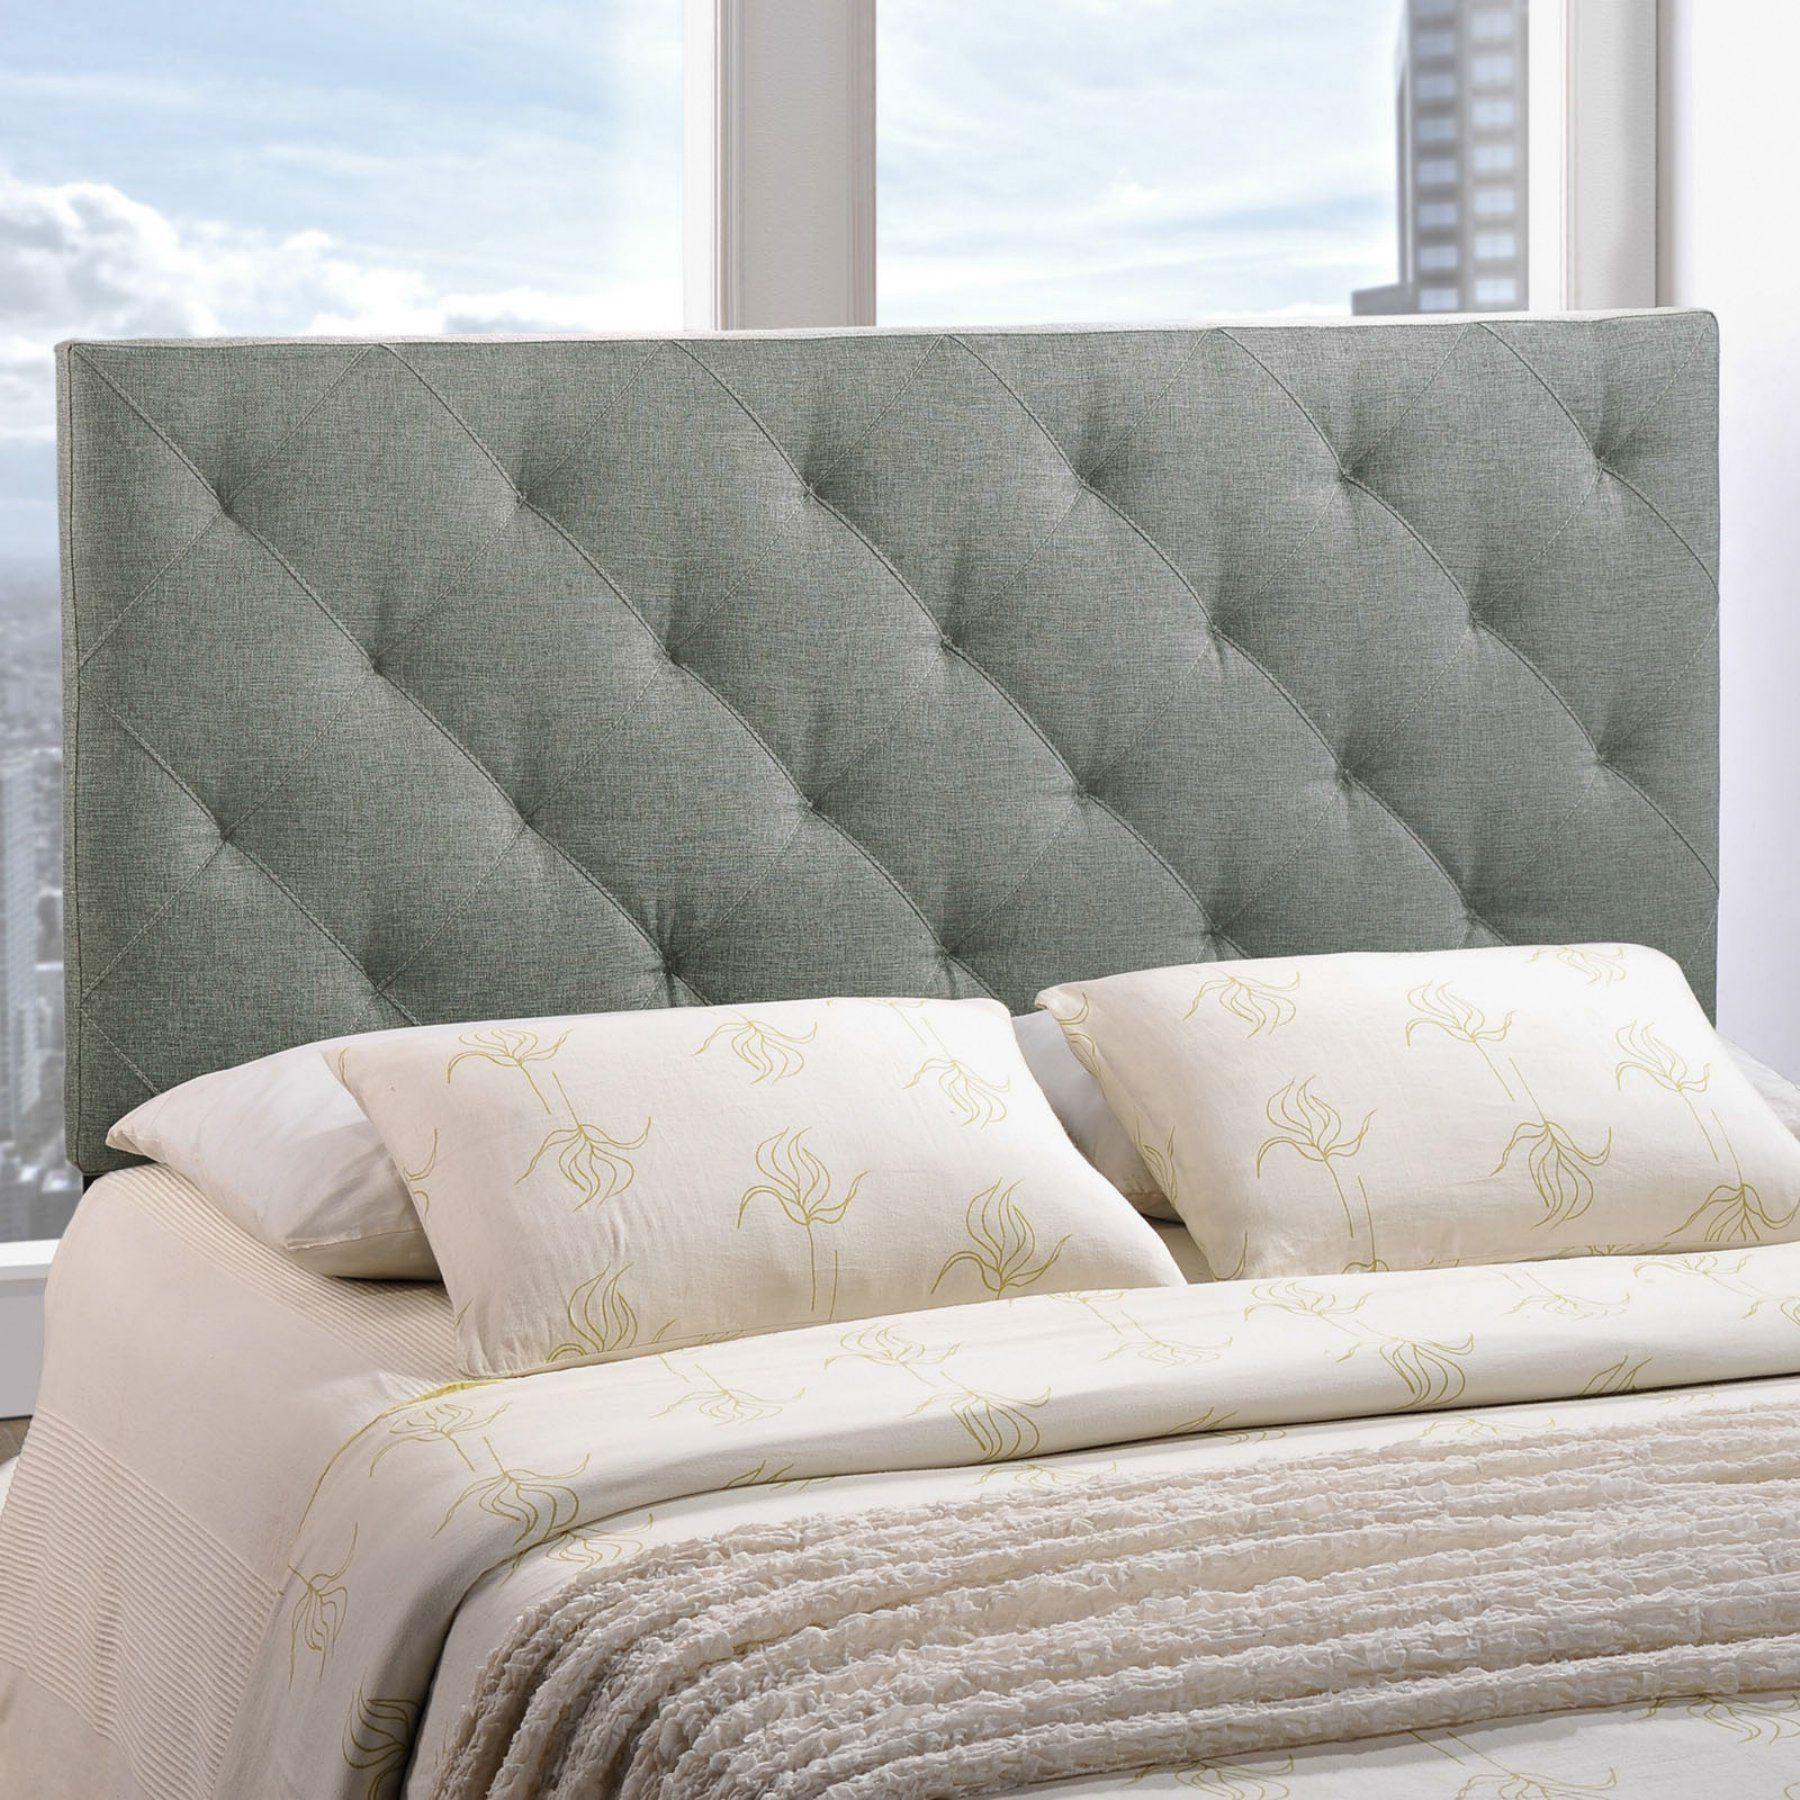 upholstered queen furniture grey designs platform navy king blue bedroom headboard tufted